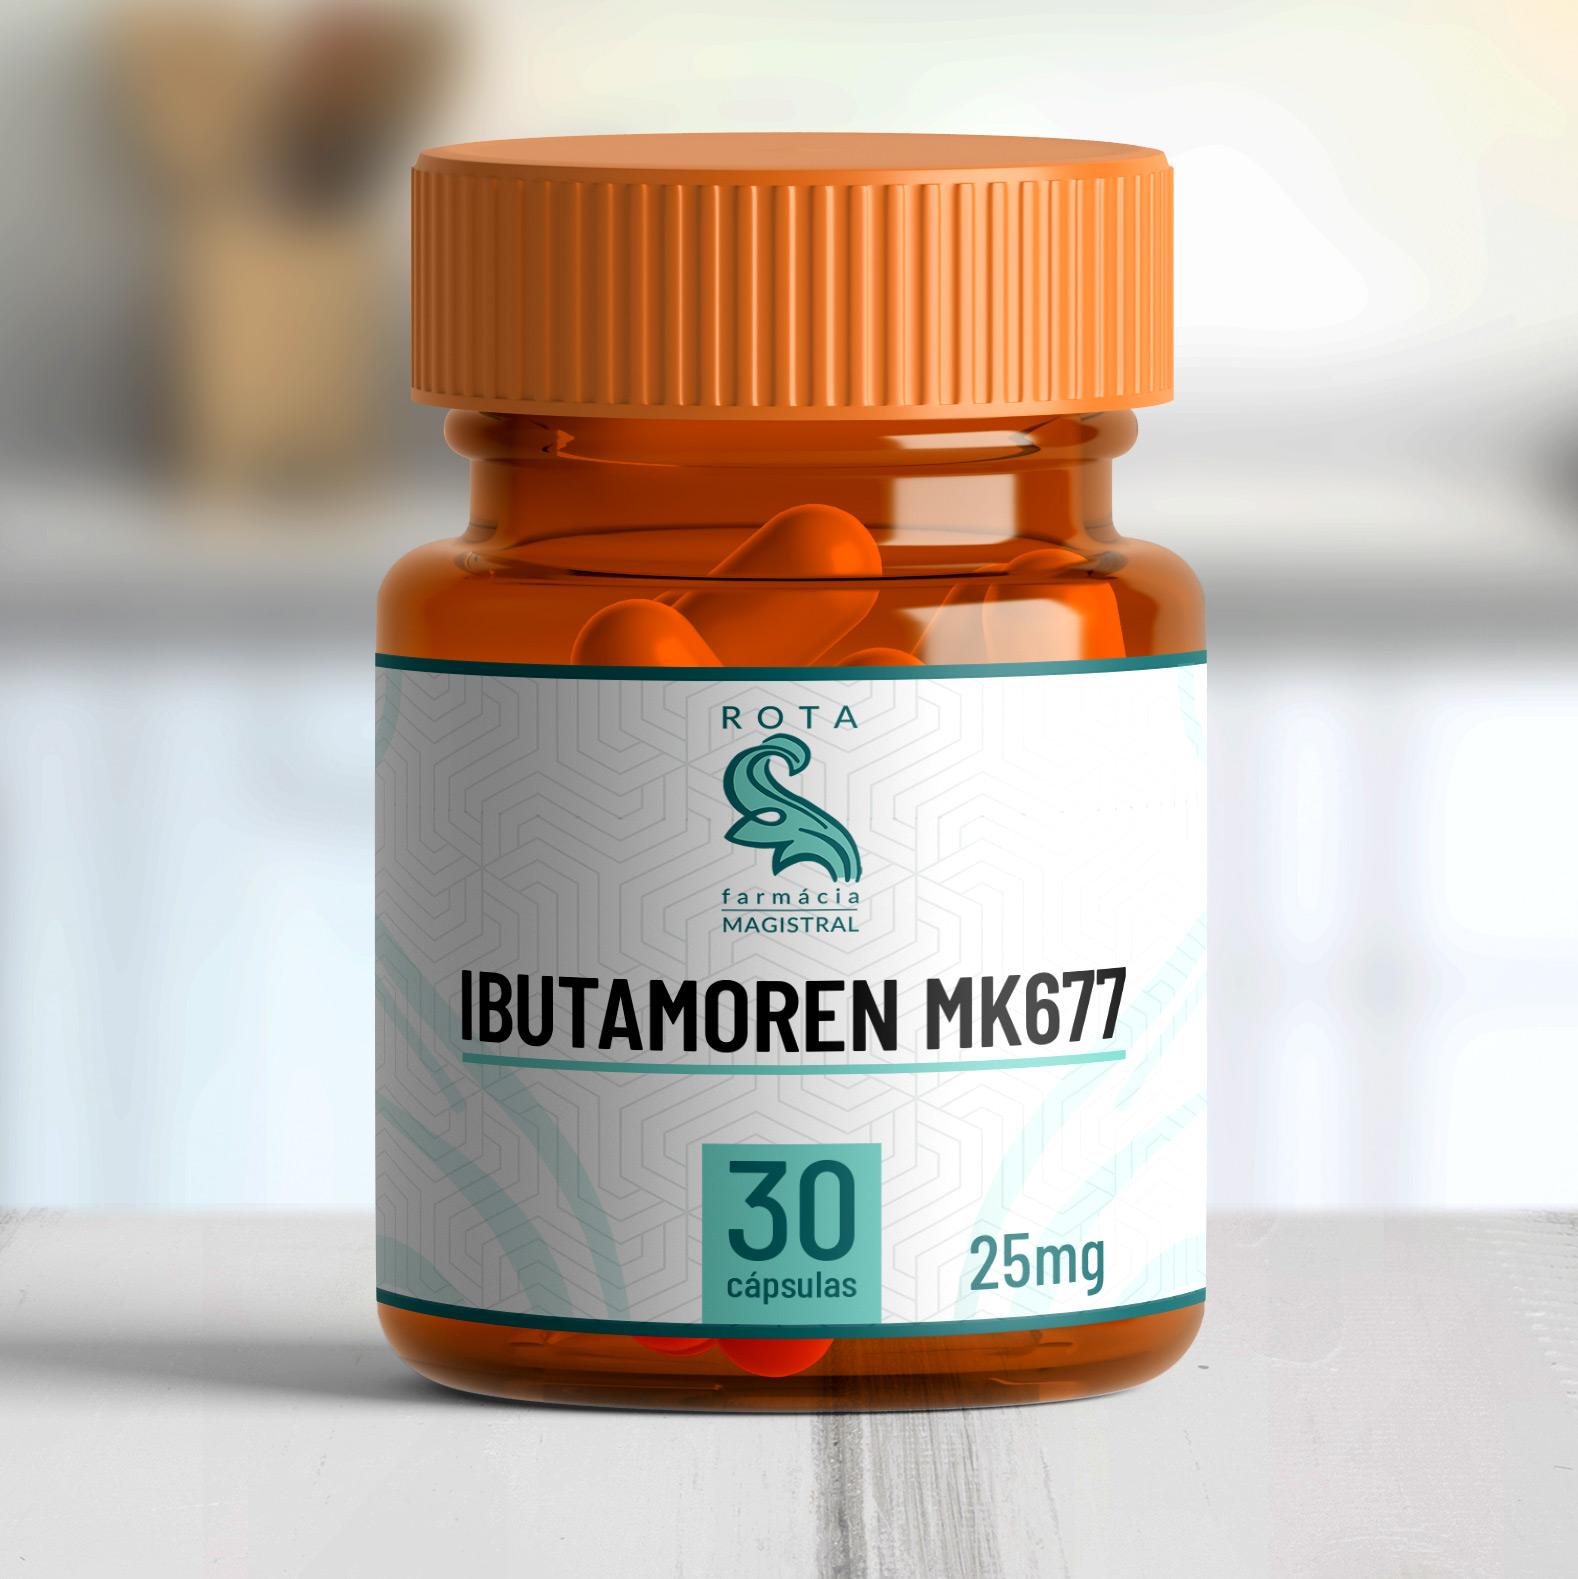 Ibutamoren MK677 25mg 30 cápsulas